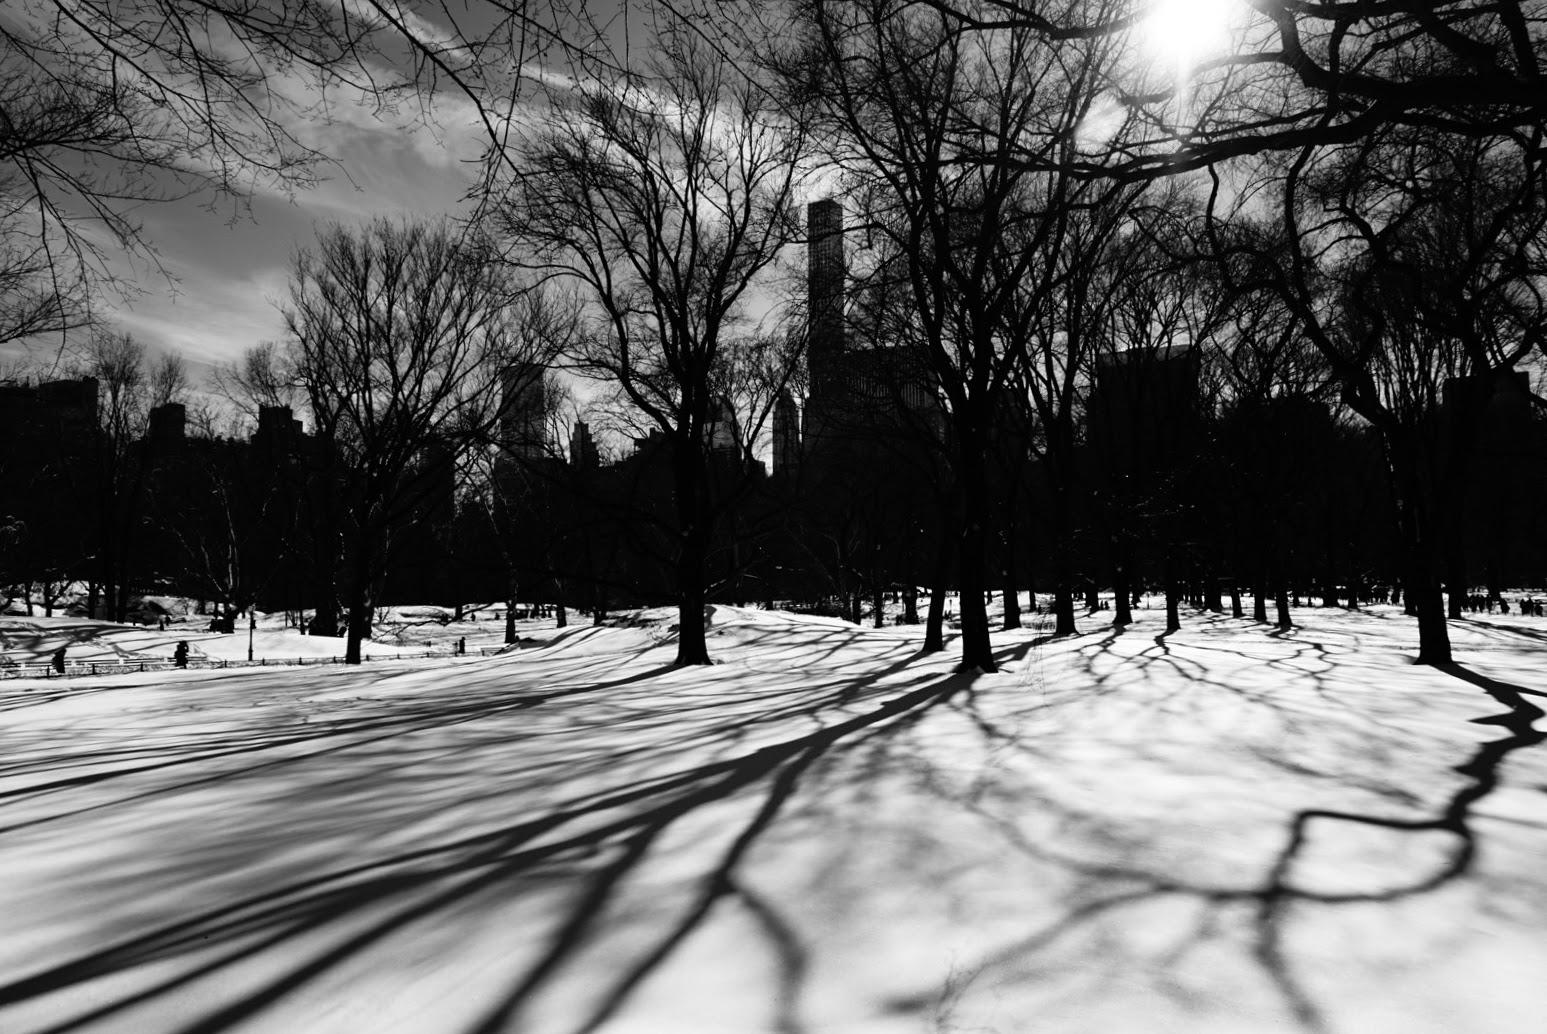 Central Park, New York (2016)